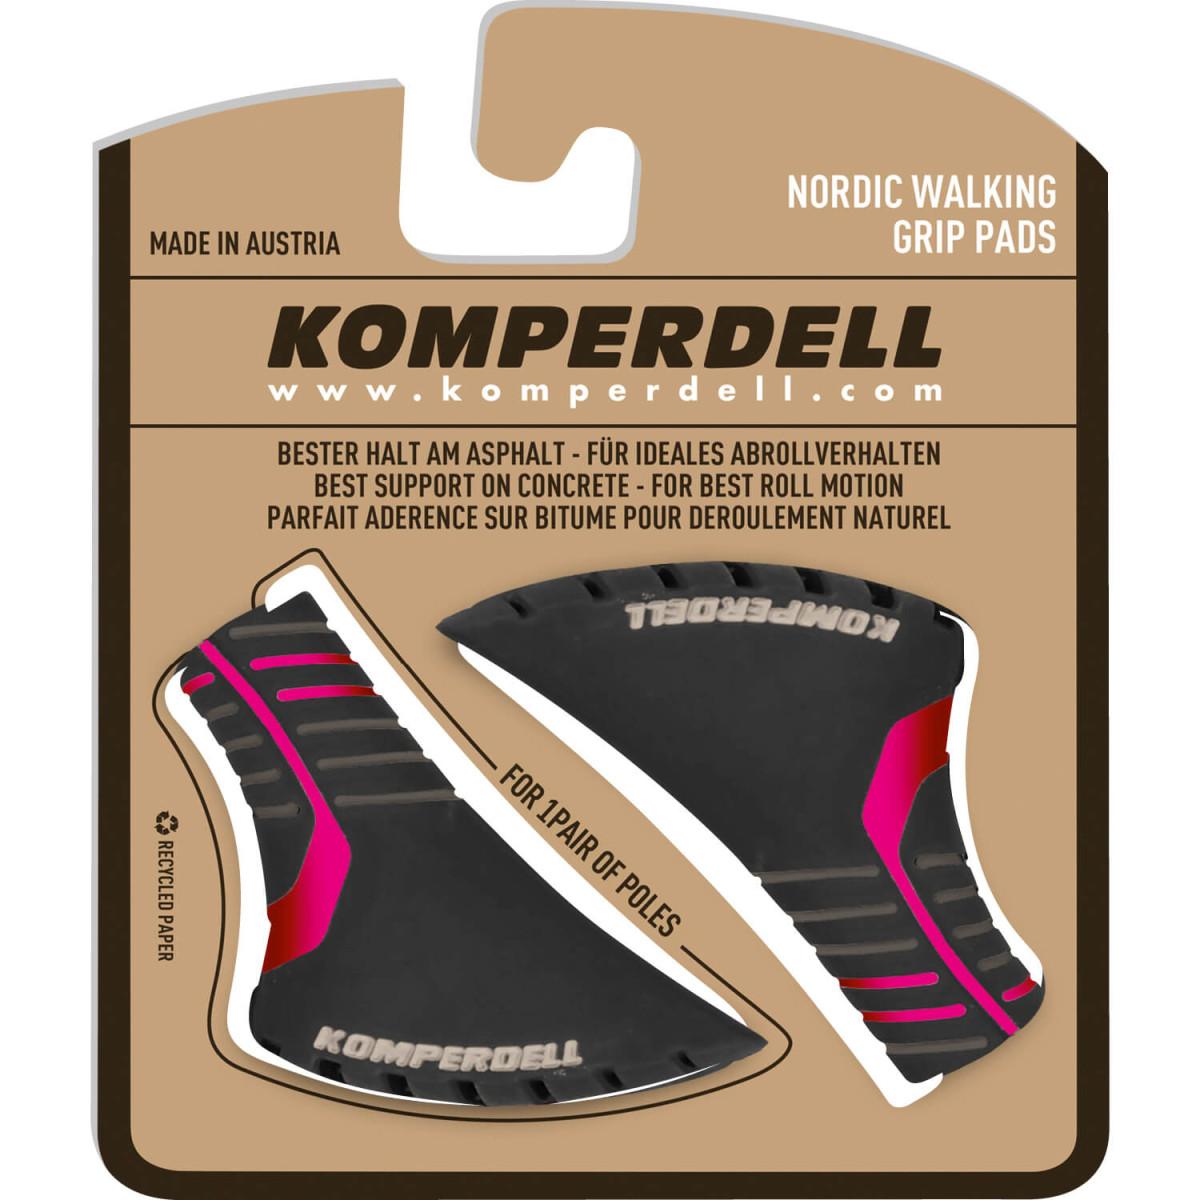 Komperdell botičky na hole Nordic Walking - červená